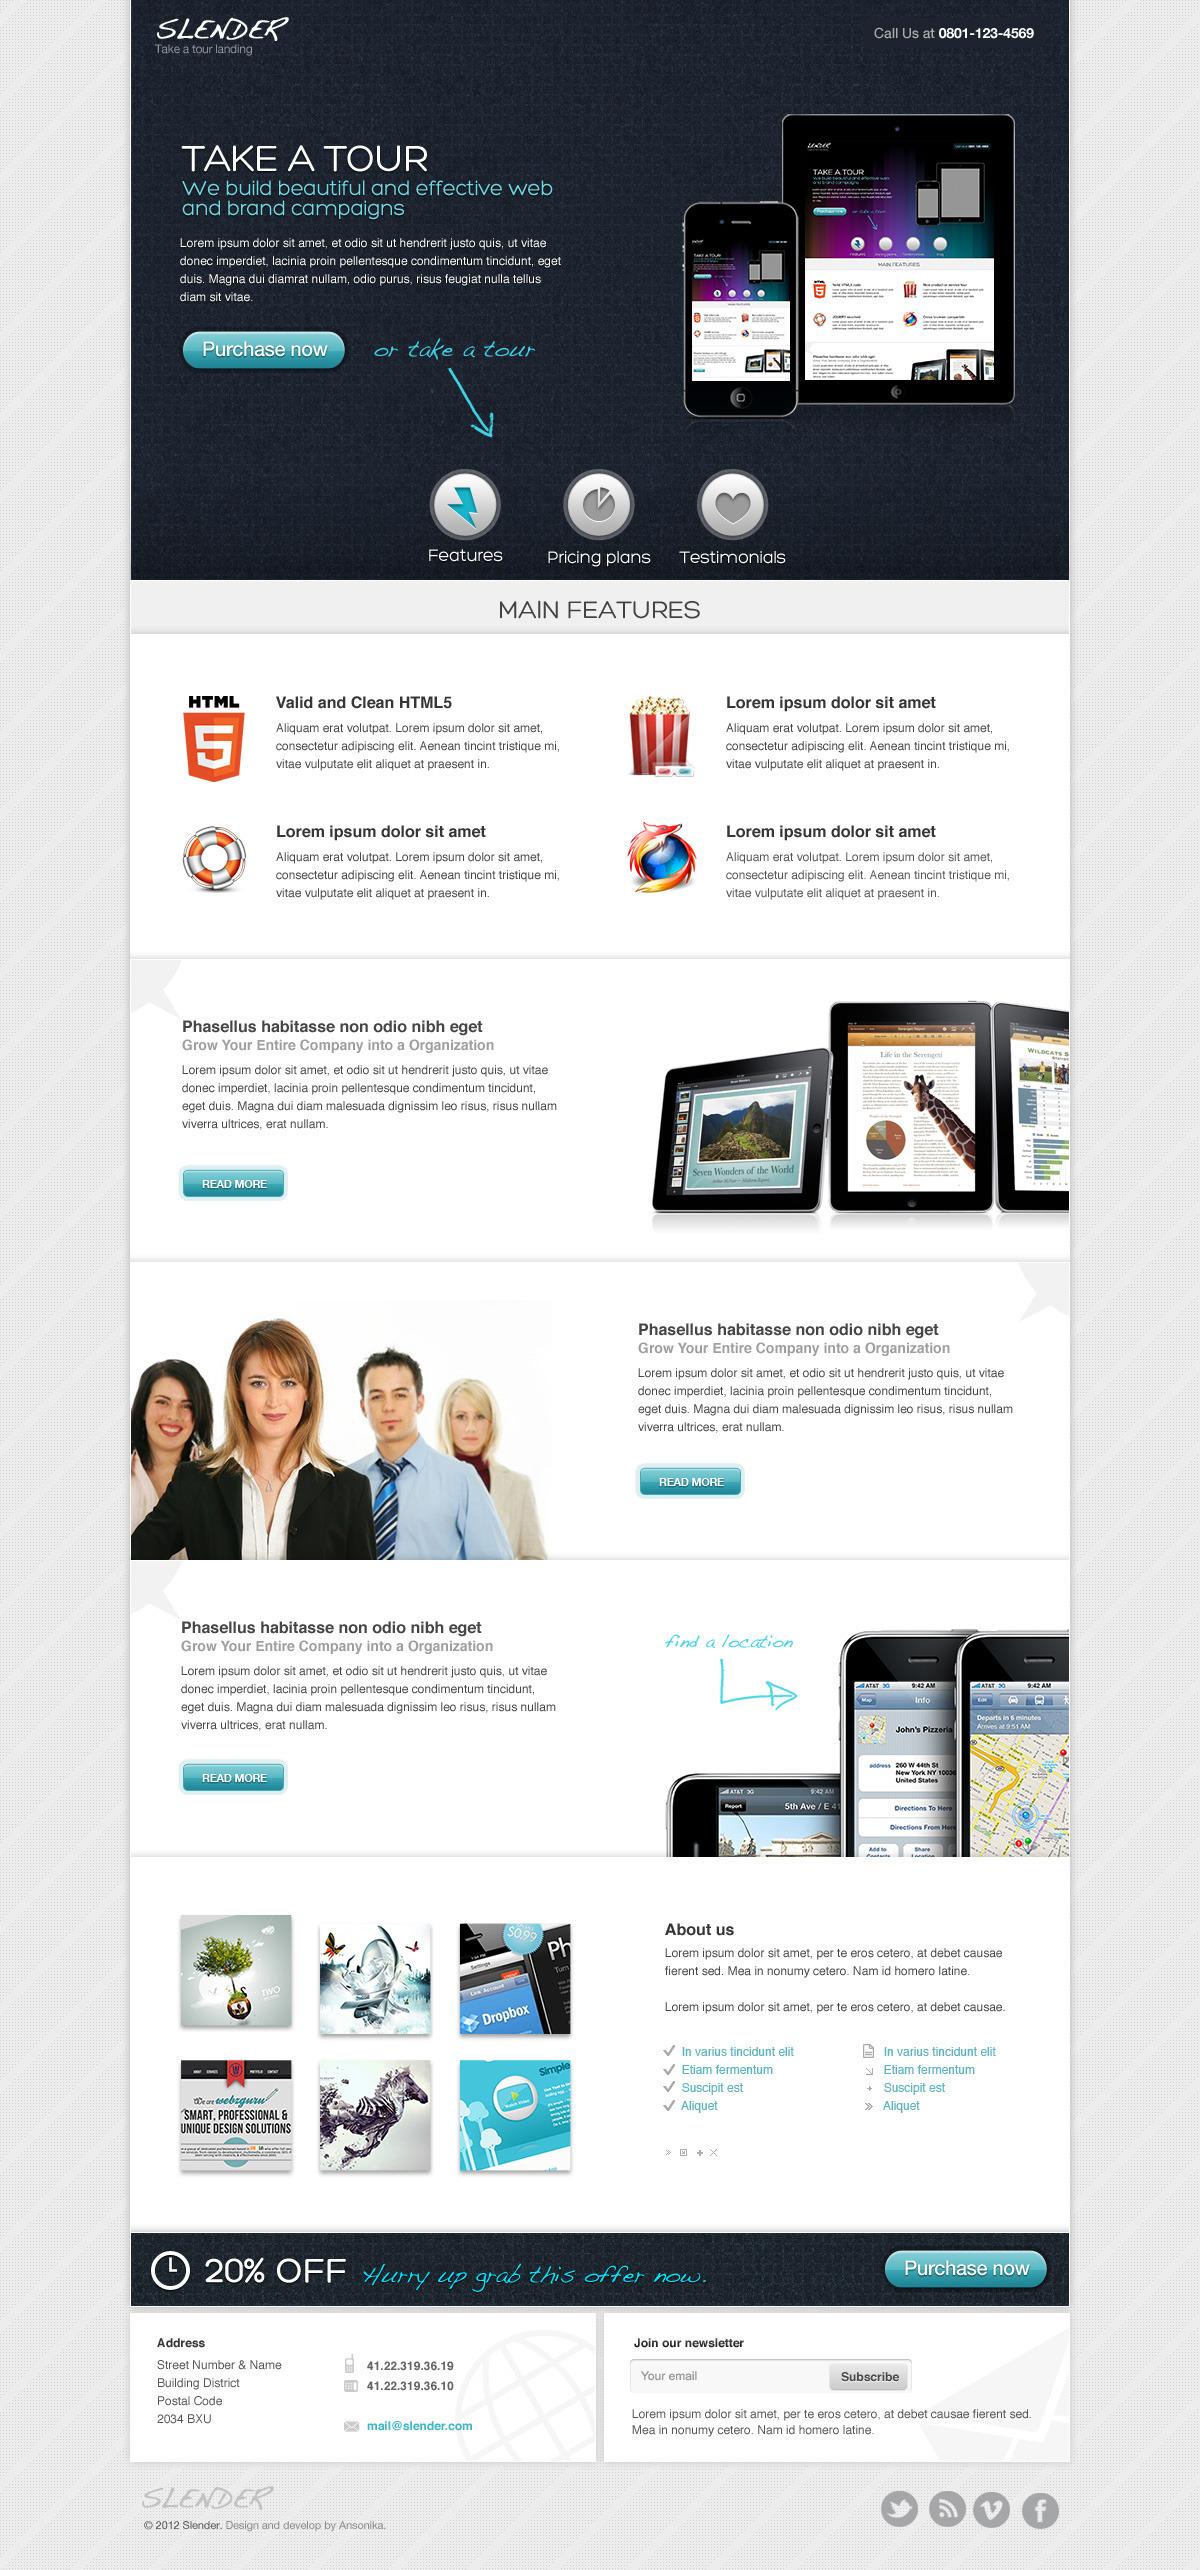 SLENDER - Take a tour micro site PSD template